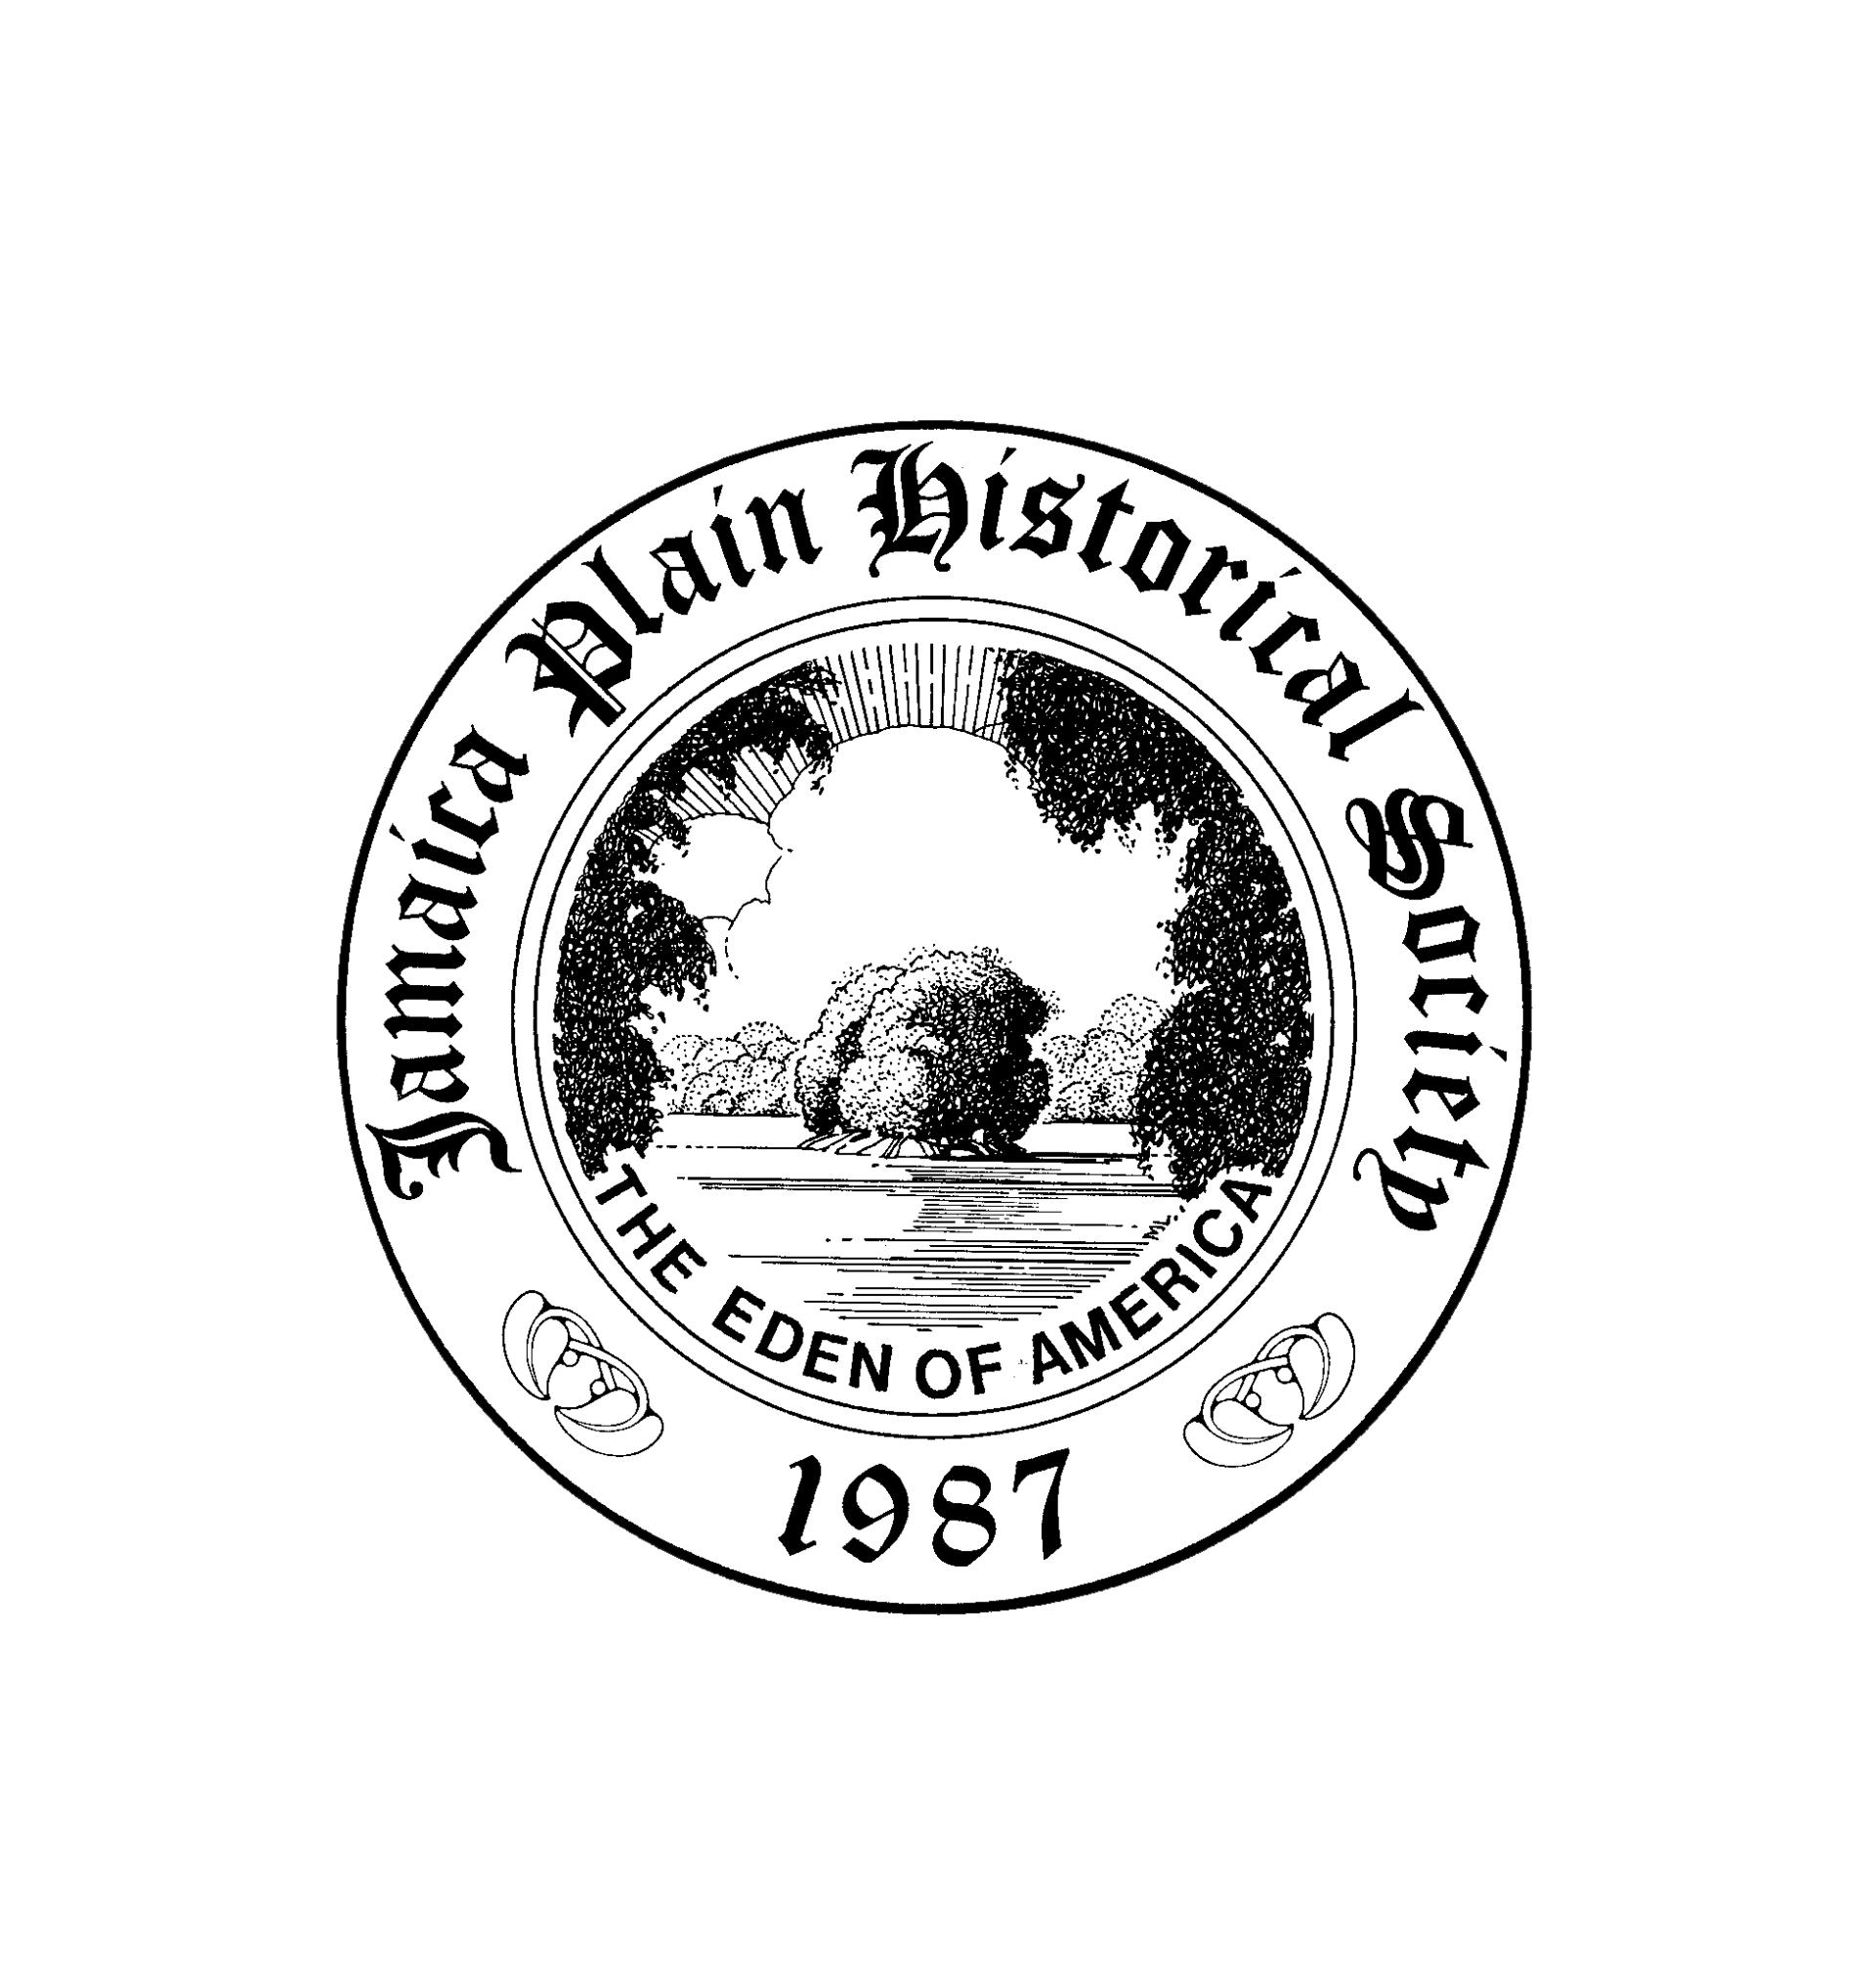 Jamaica Plain Historical Society image